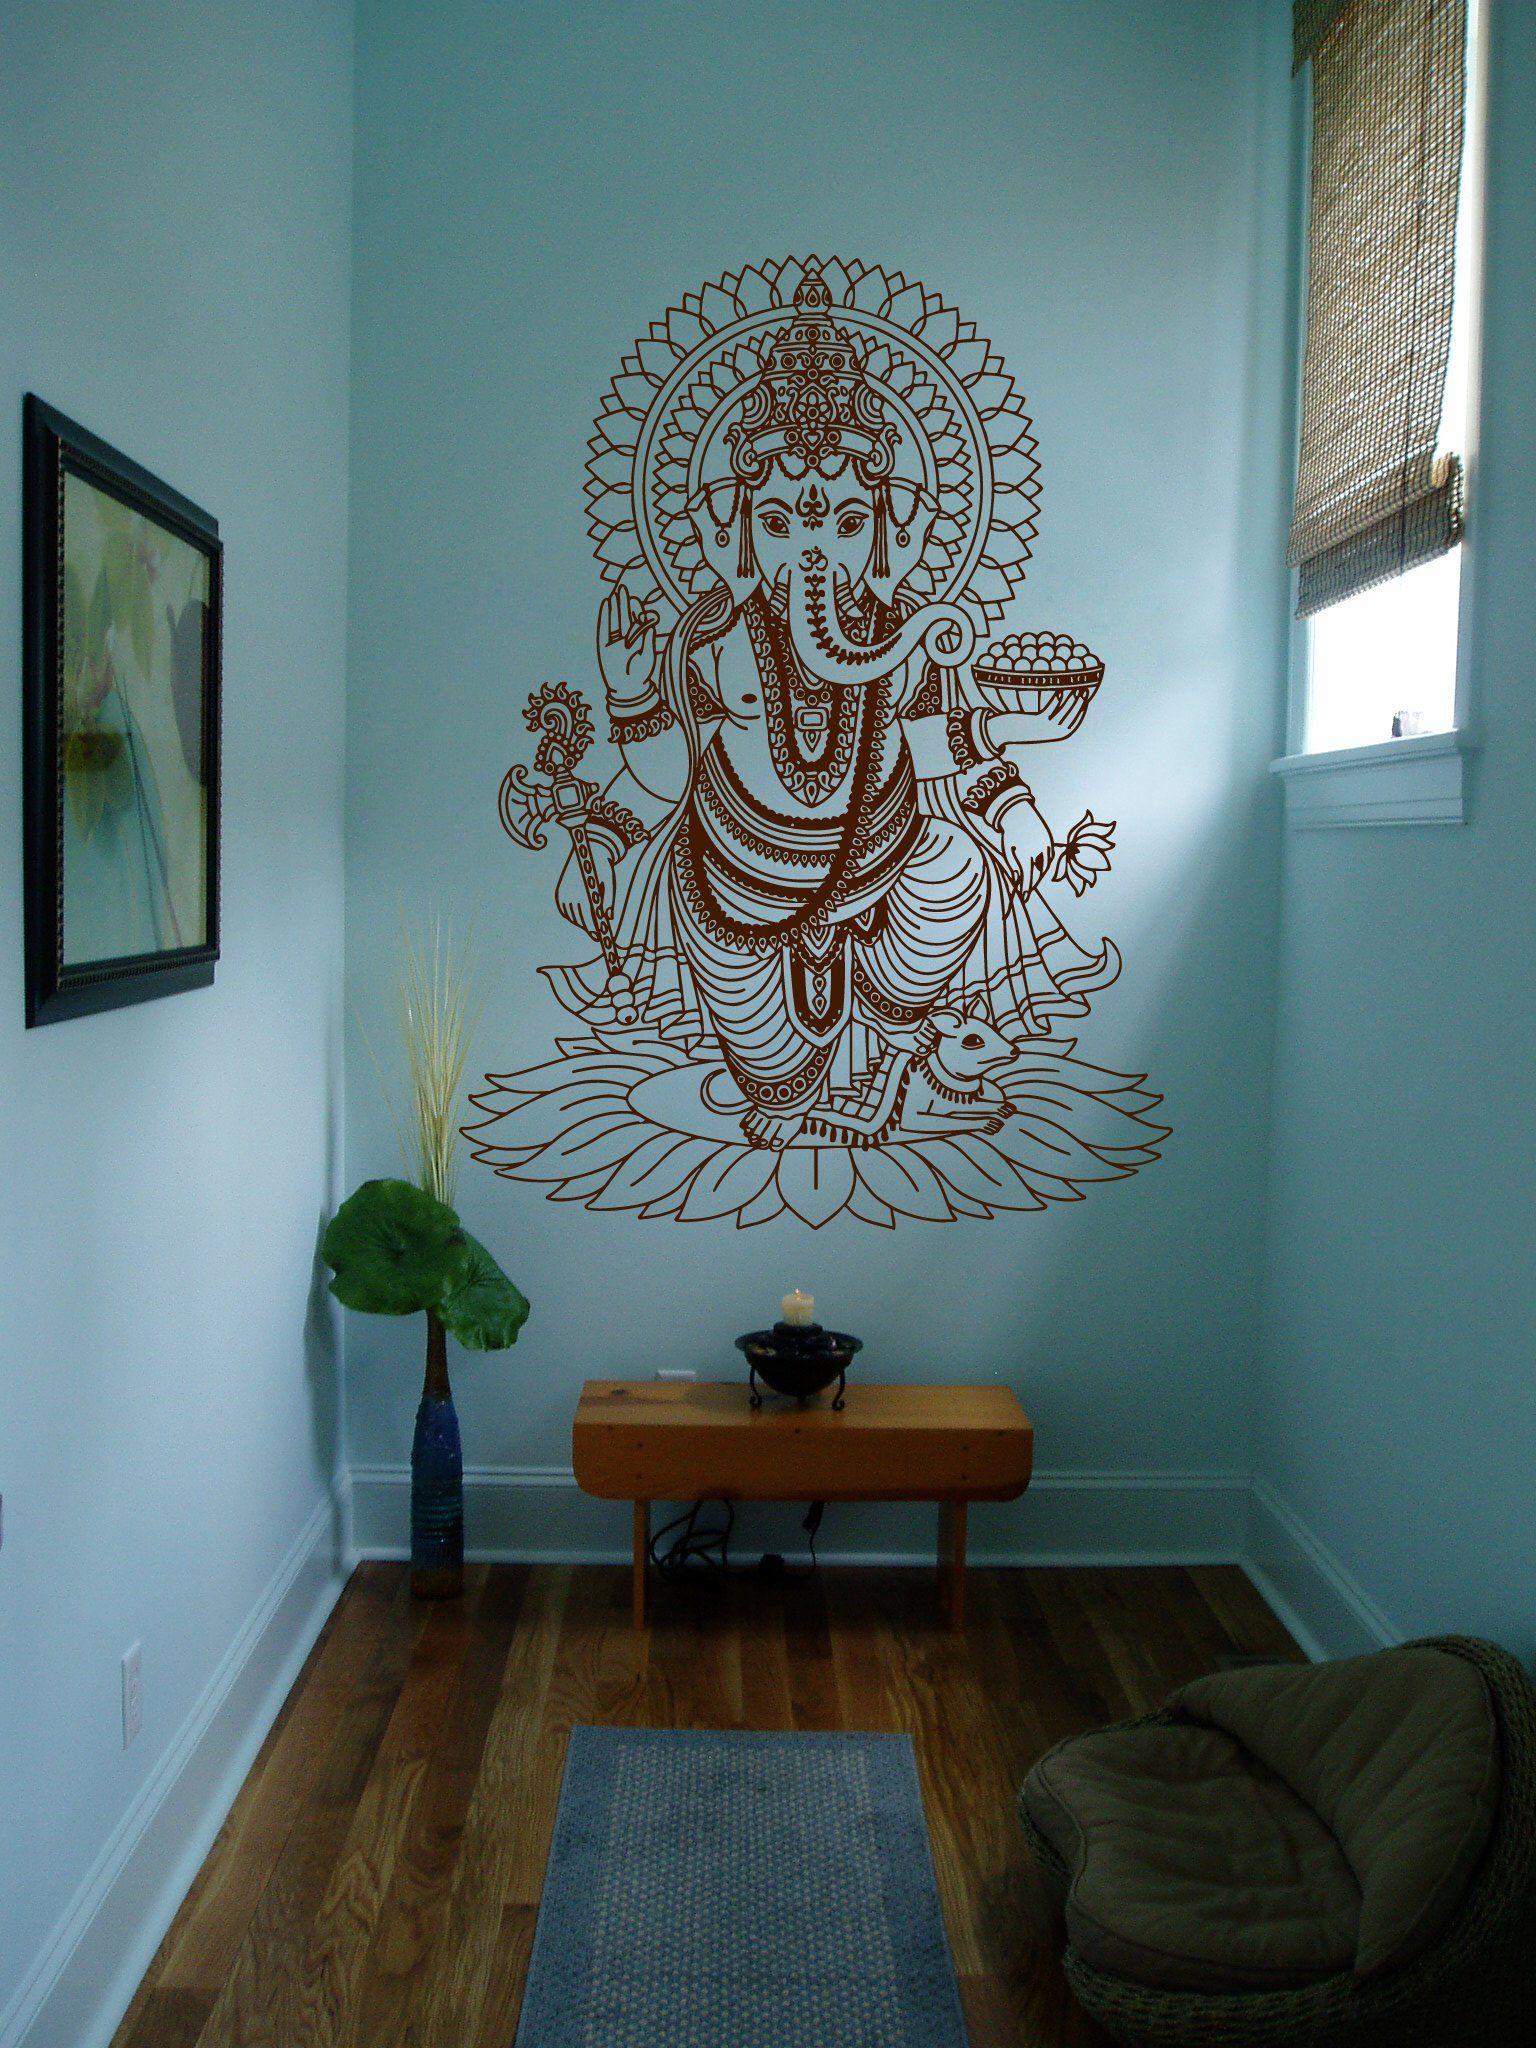 ik430 wall decal sticker room decor wall art mural indian god om elephant hindu success buddha. Black Bedroom Furniture Sets. Home Design Ideas